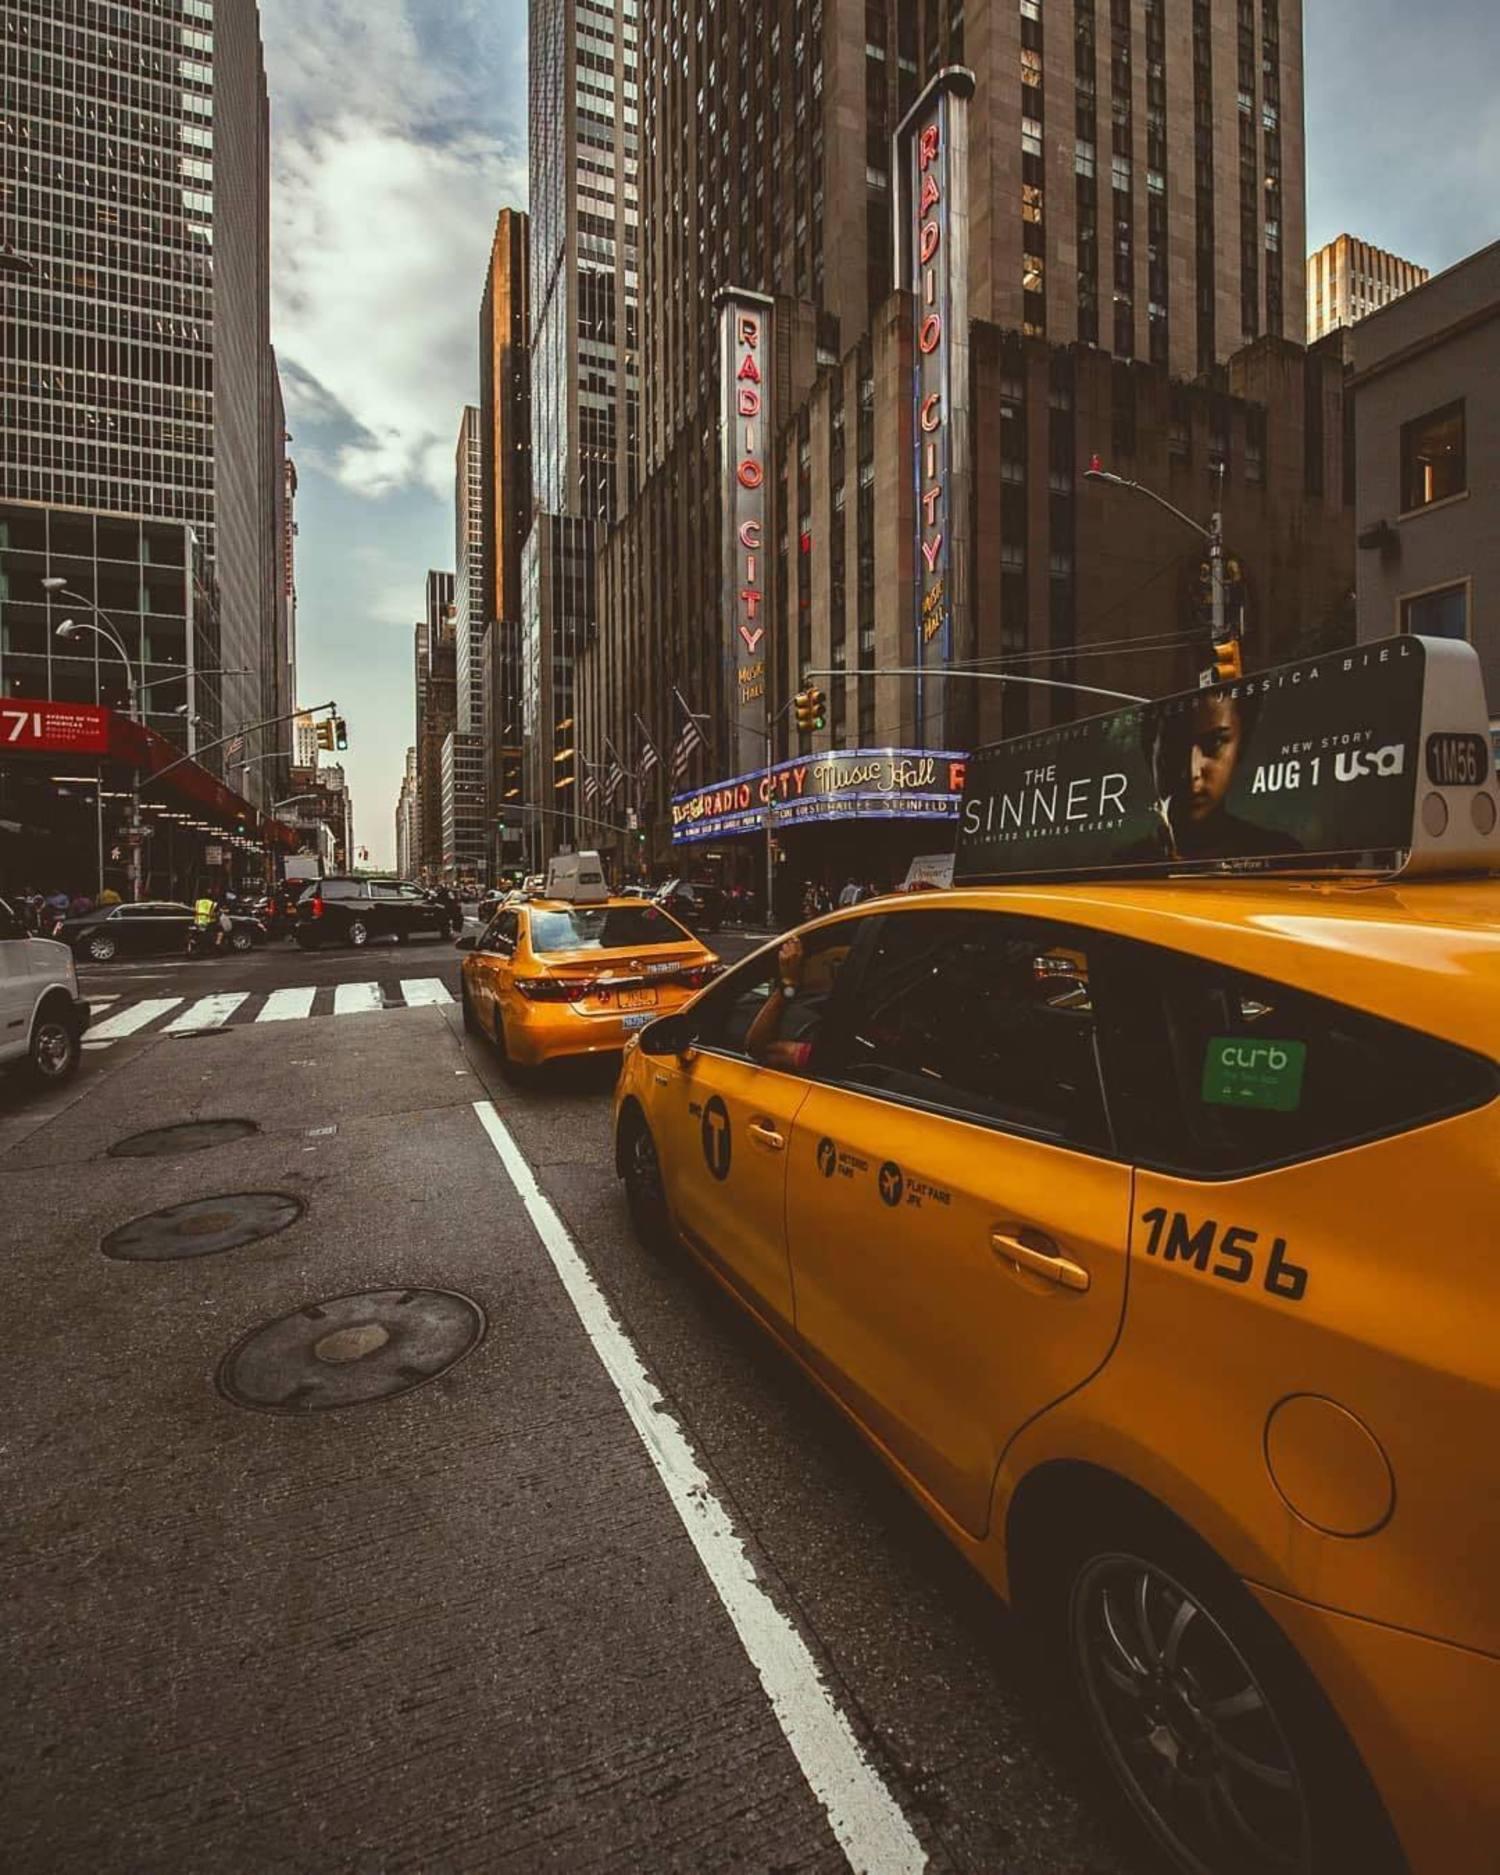 New York, New York. Photo via @m_bautista330 #viewingnyc #newyork #newyorkcity #nyc #taxis #6thavenue #radiocitymusichall